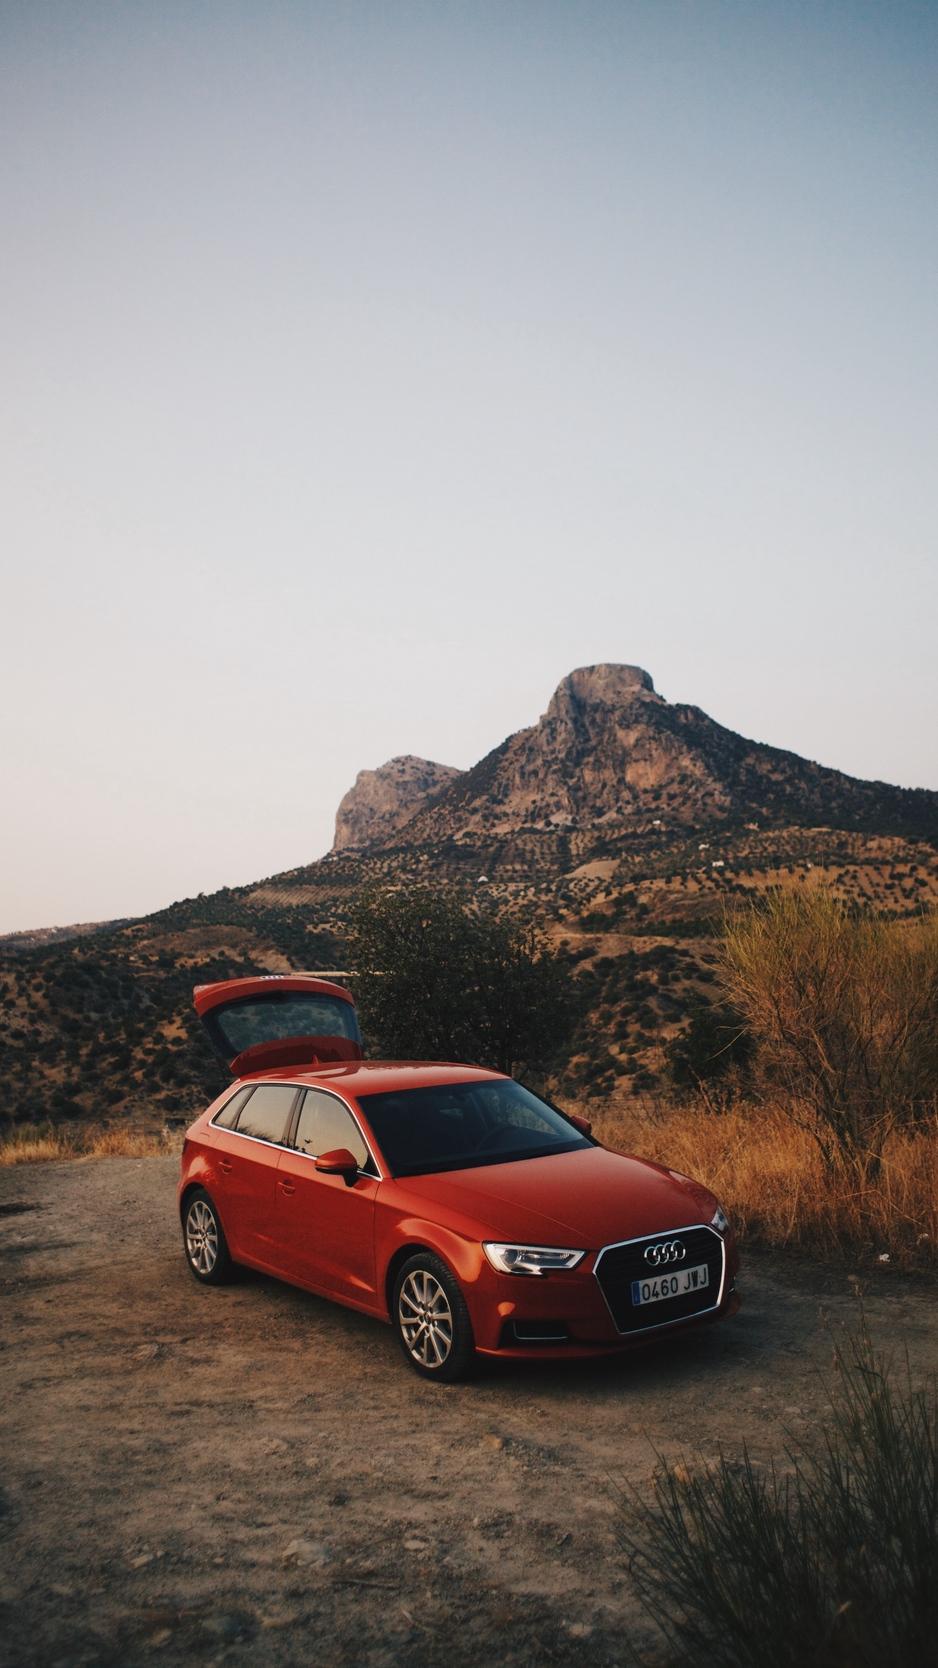 Free Download Download Wallpaper 938x1668 Audi Q5 Red